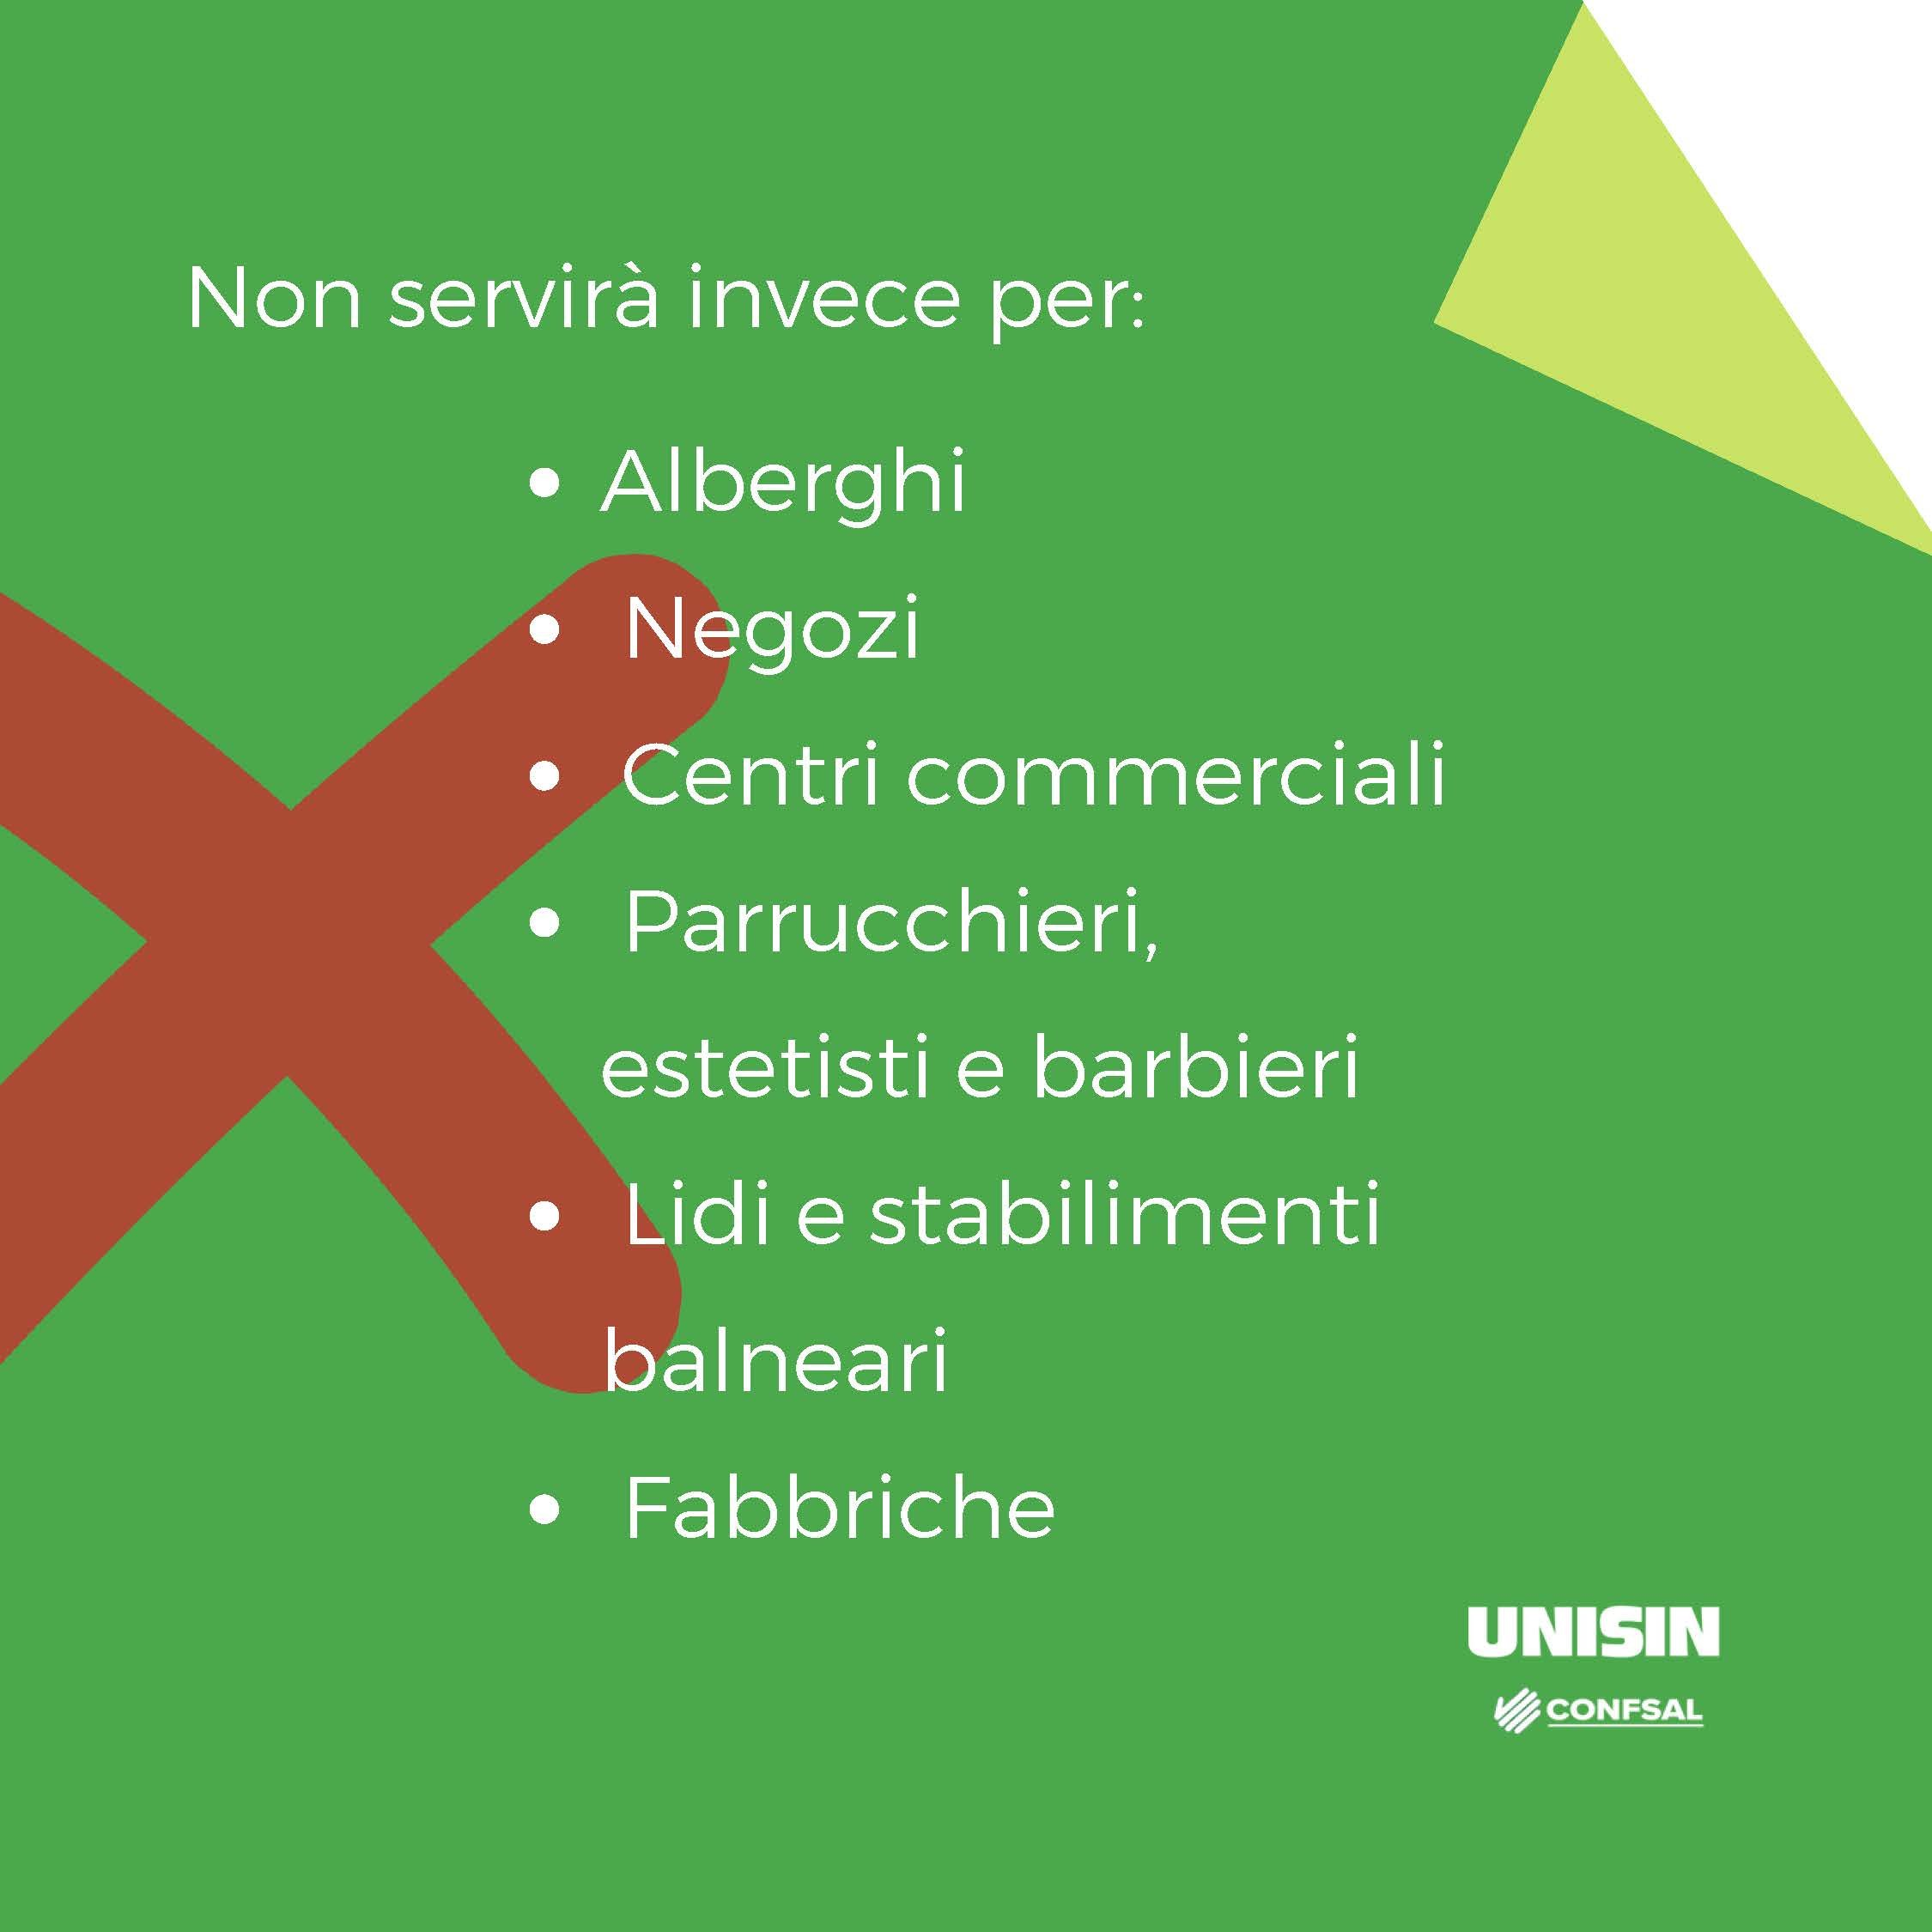 20210723 Infografica Unisin NUOVO GREENPASS (1)_Pagina_05